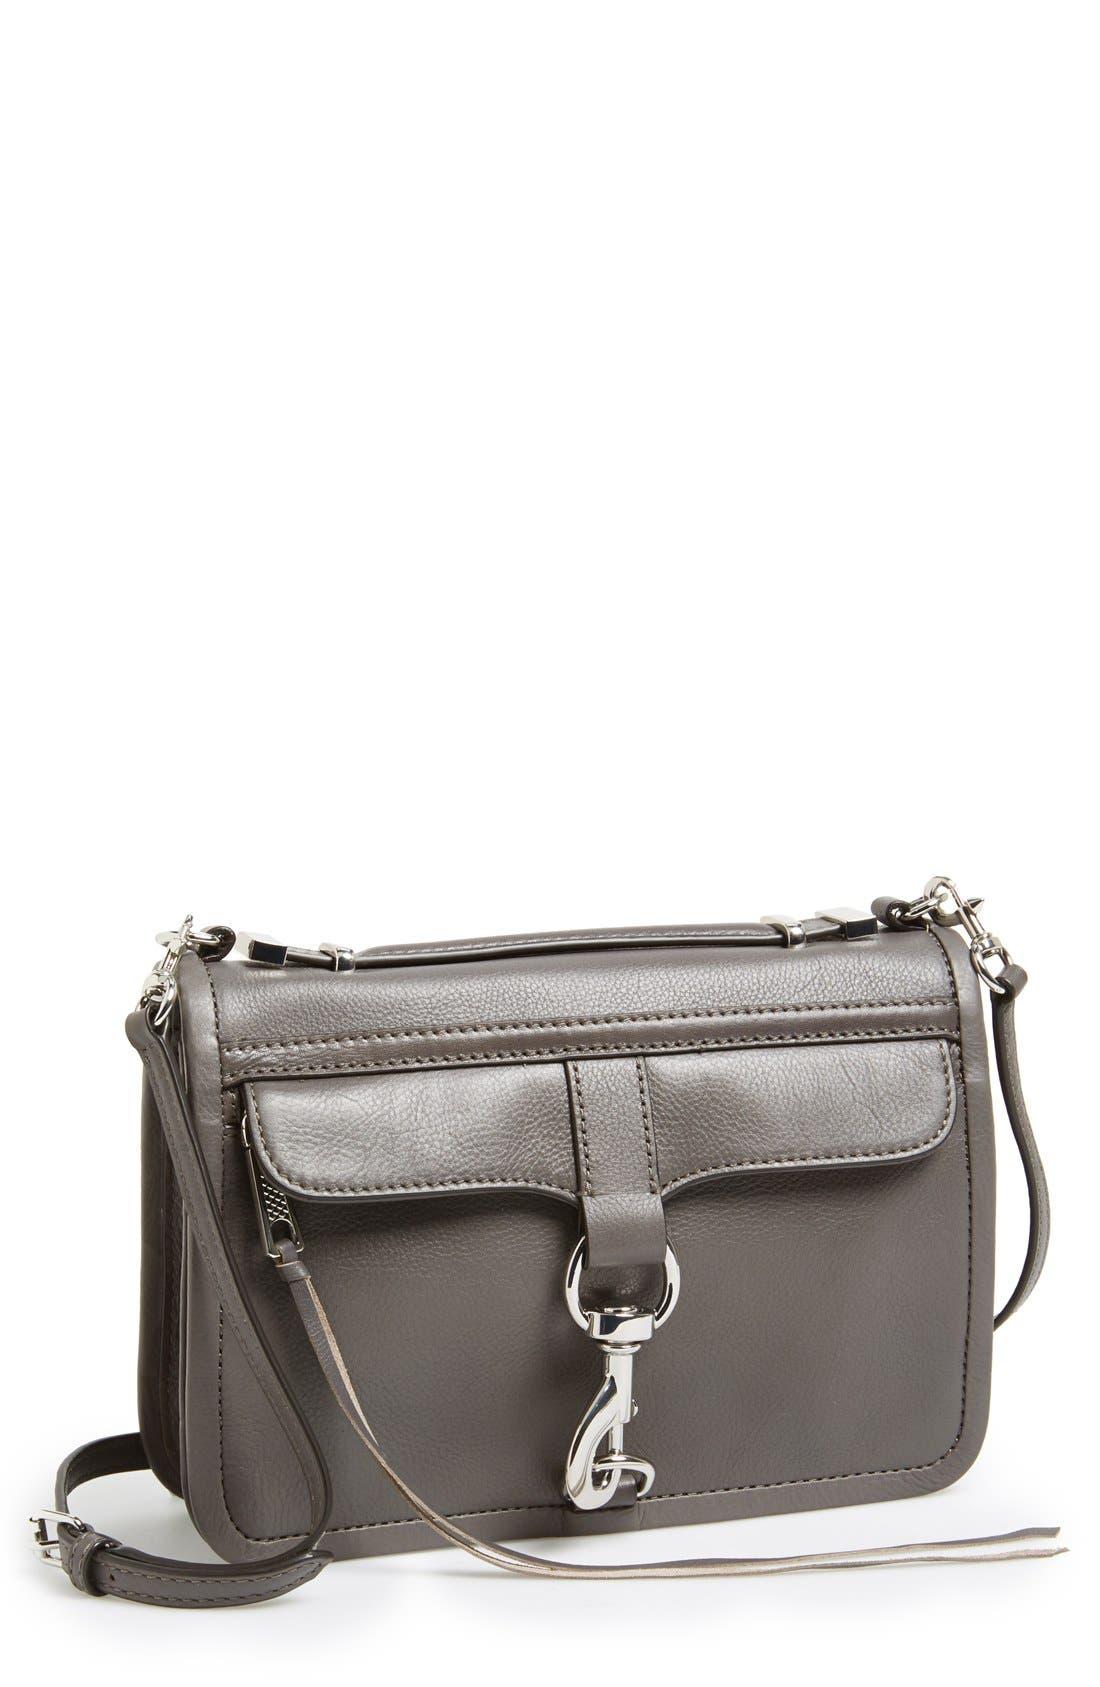 Main Image - Rebecca Minkoff 'Bowery' Convertible Crossbody Bag